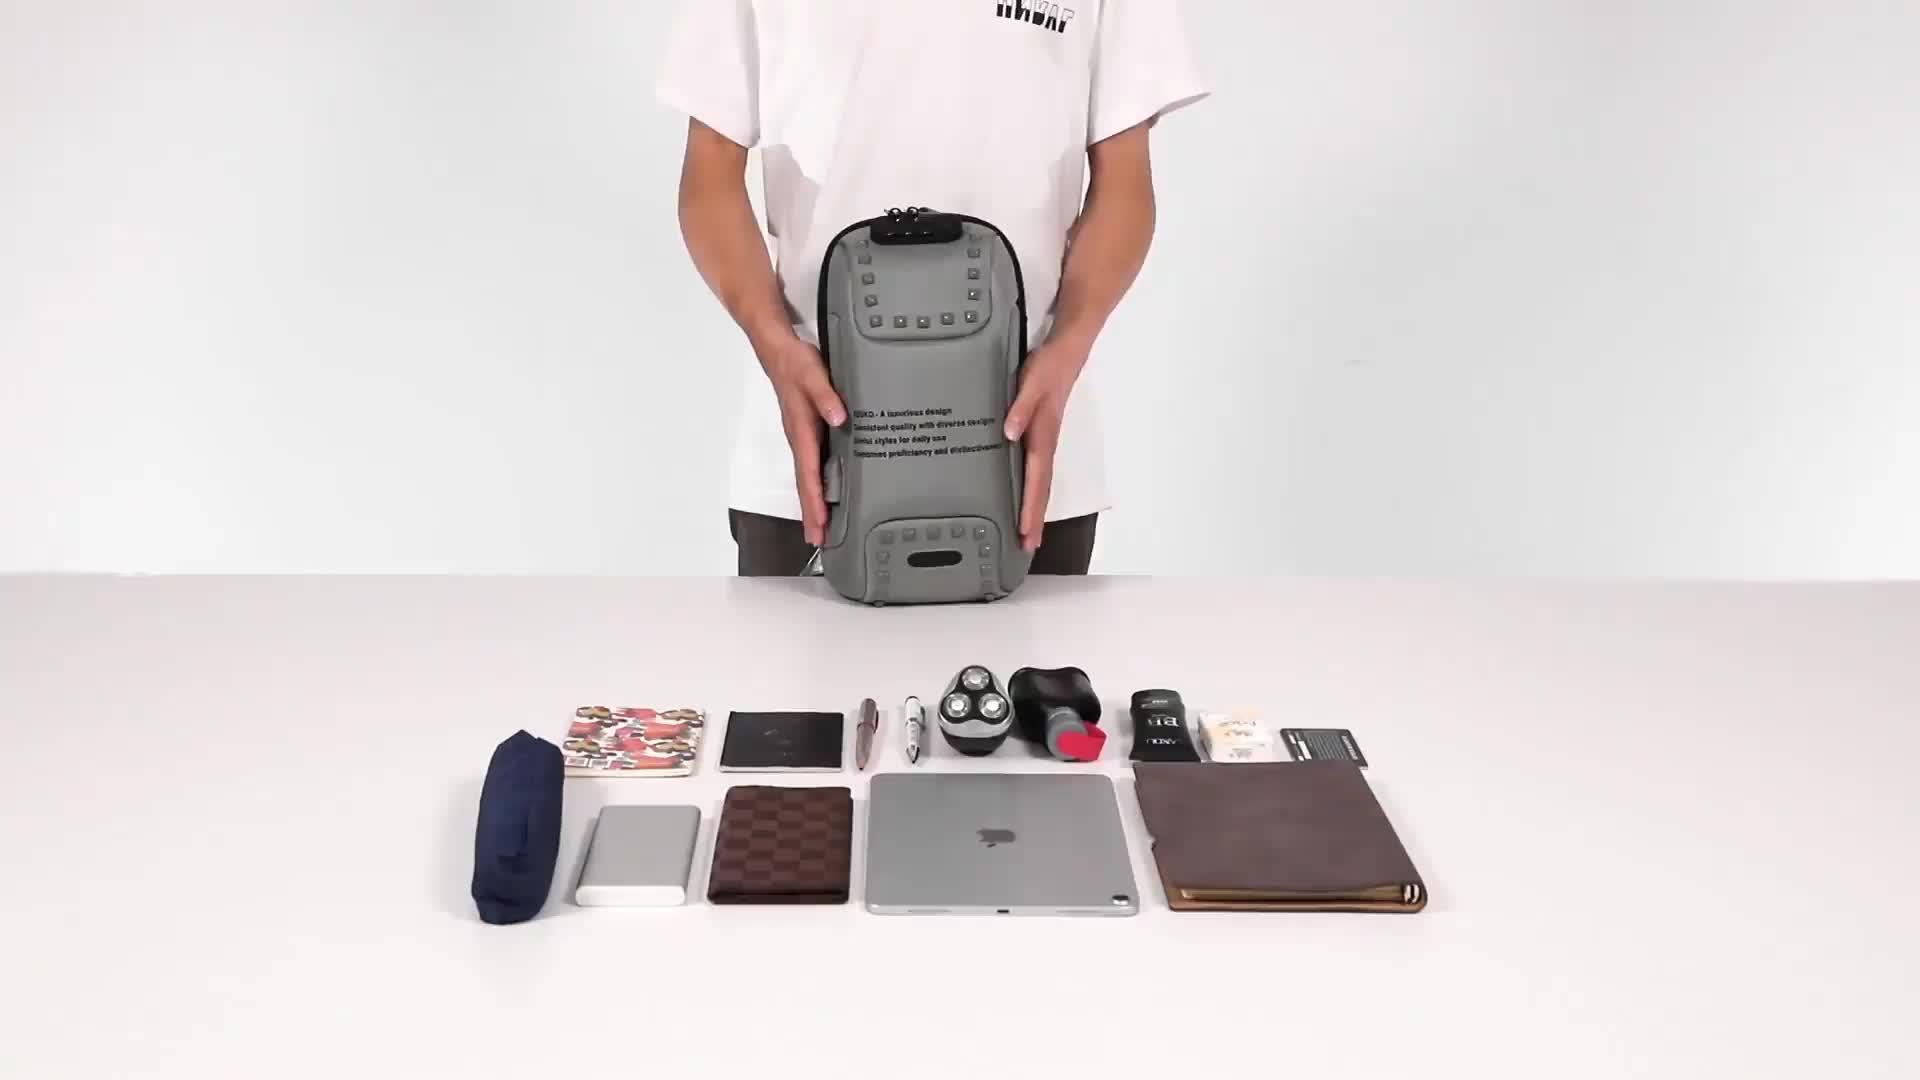 Ozuko Mode Mannen Klinknagel Crossbody Zakken Anti-Diefstal Messenger Bag Usb Opladen Borst Pakken Korte Trip Waterafstotend Schouder tas